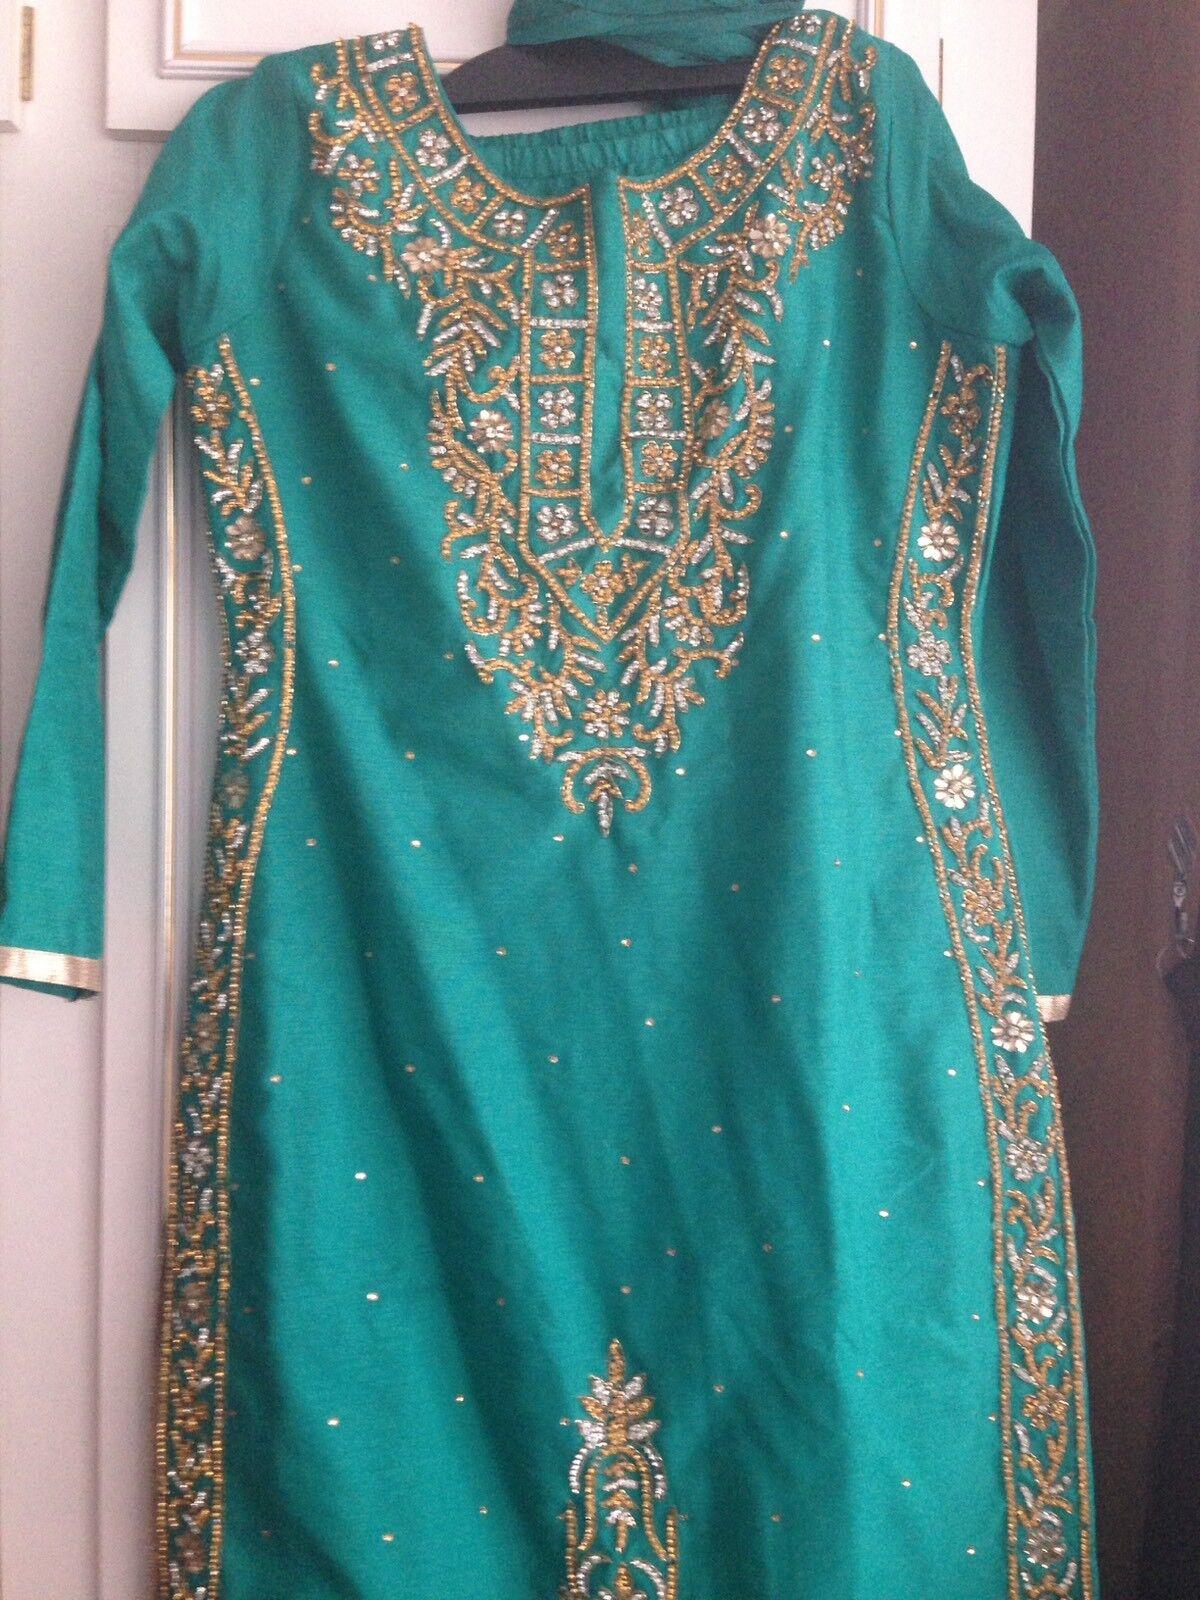 Asiático para para para mujer Cerceta Talla 8 10 atuendo con gemas para Eid Diwali bodas fiestas c33f0e